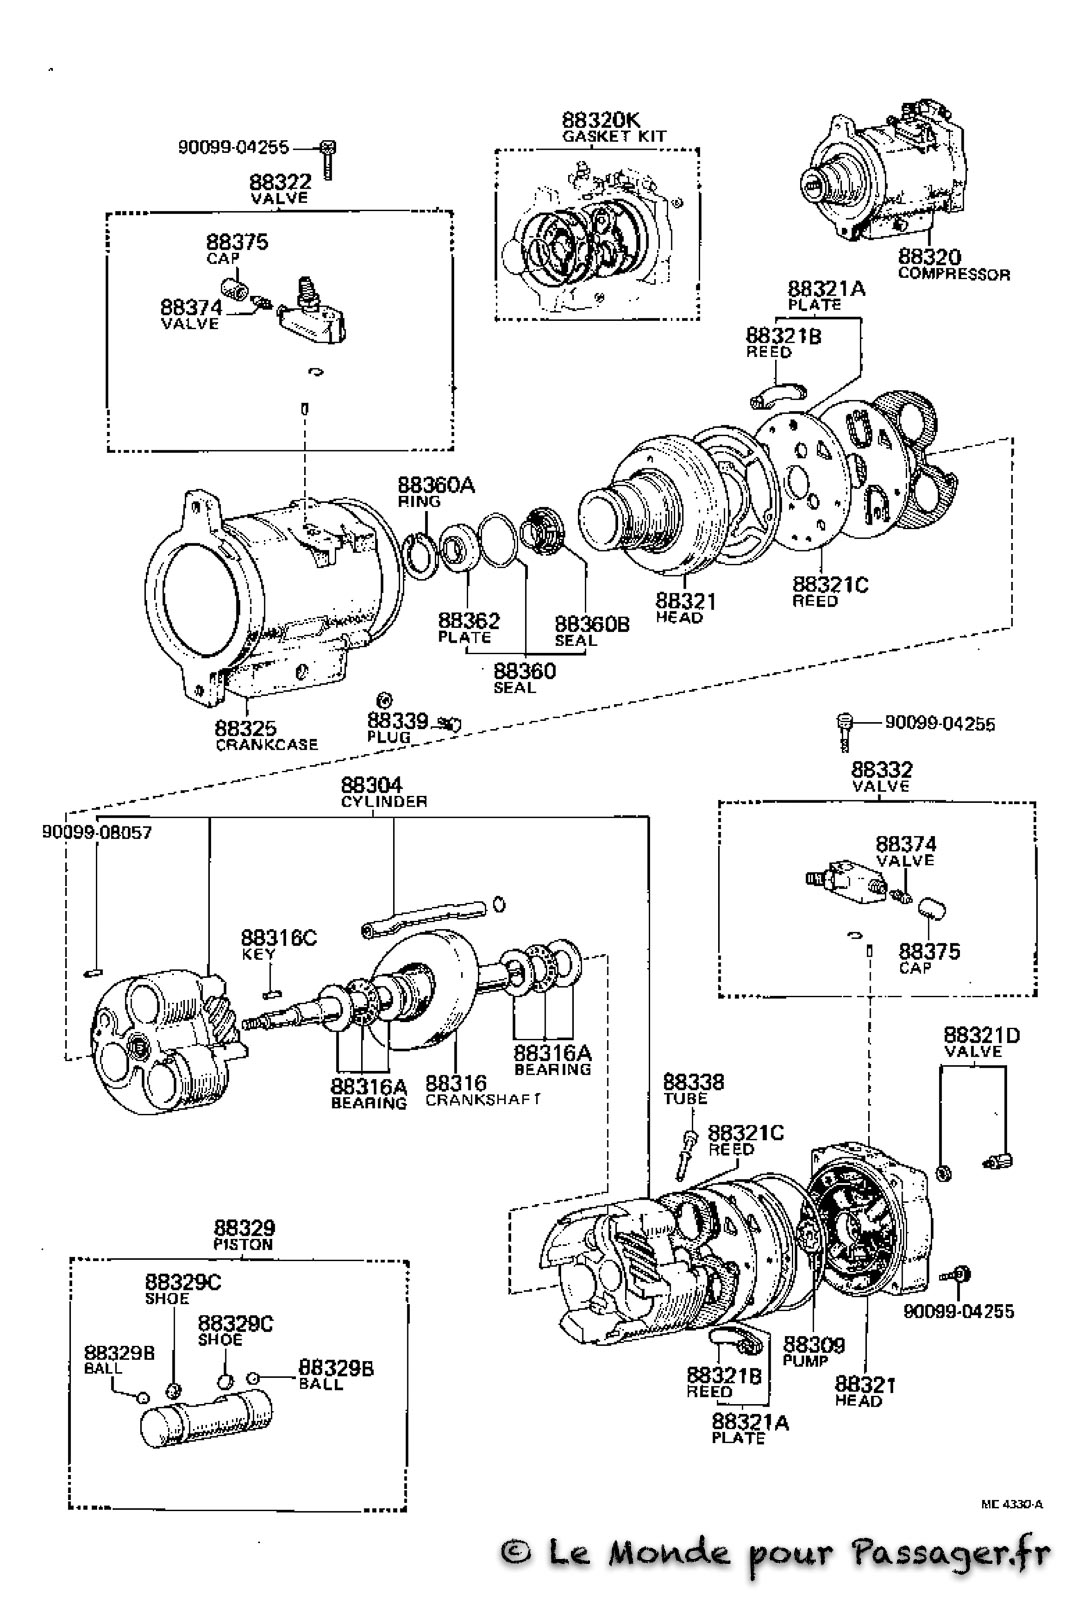 Fj55-Eclatés-Techniques144